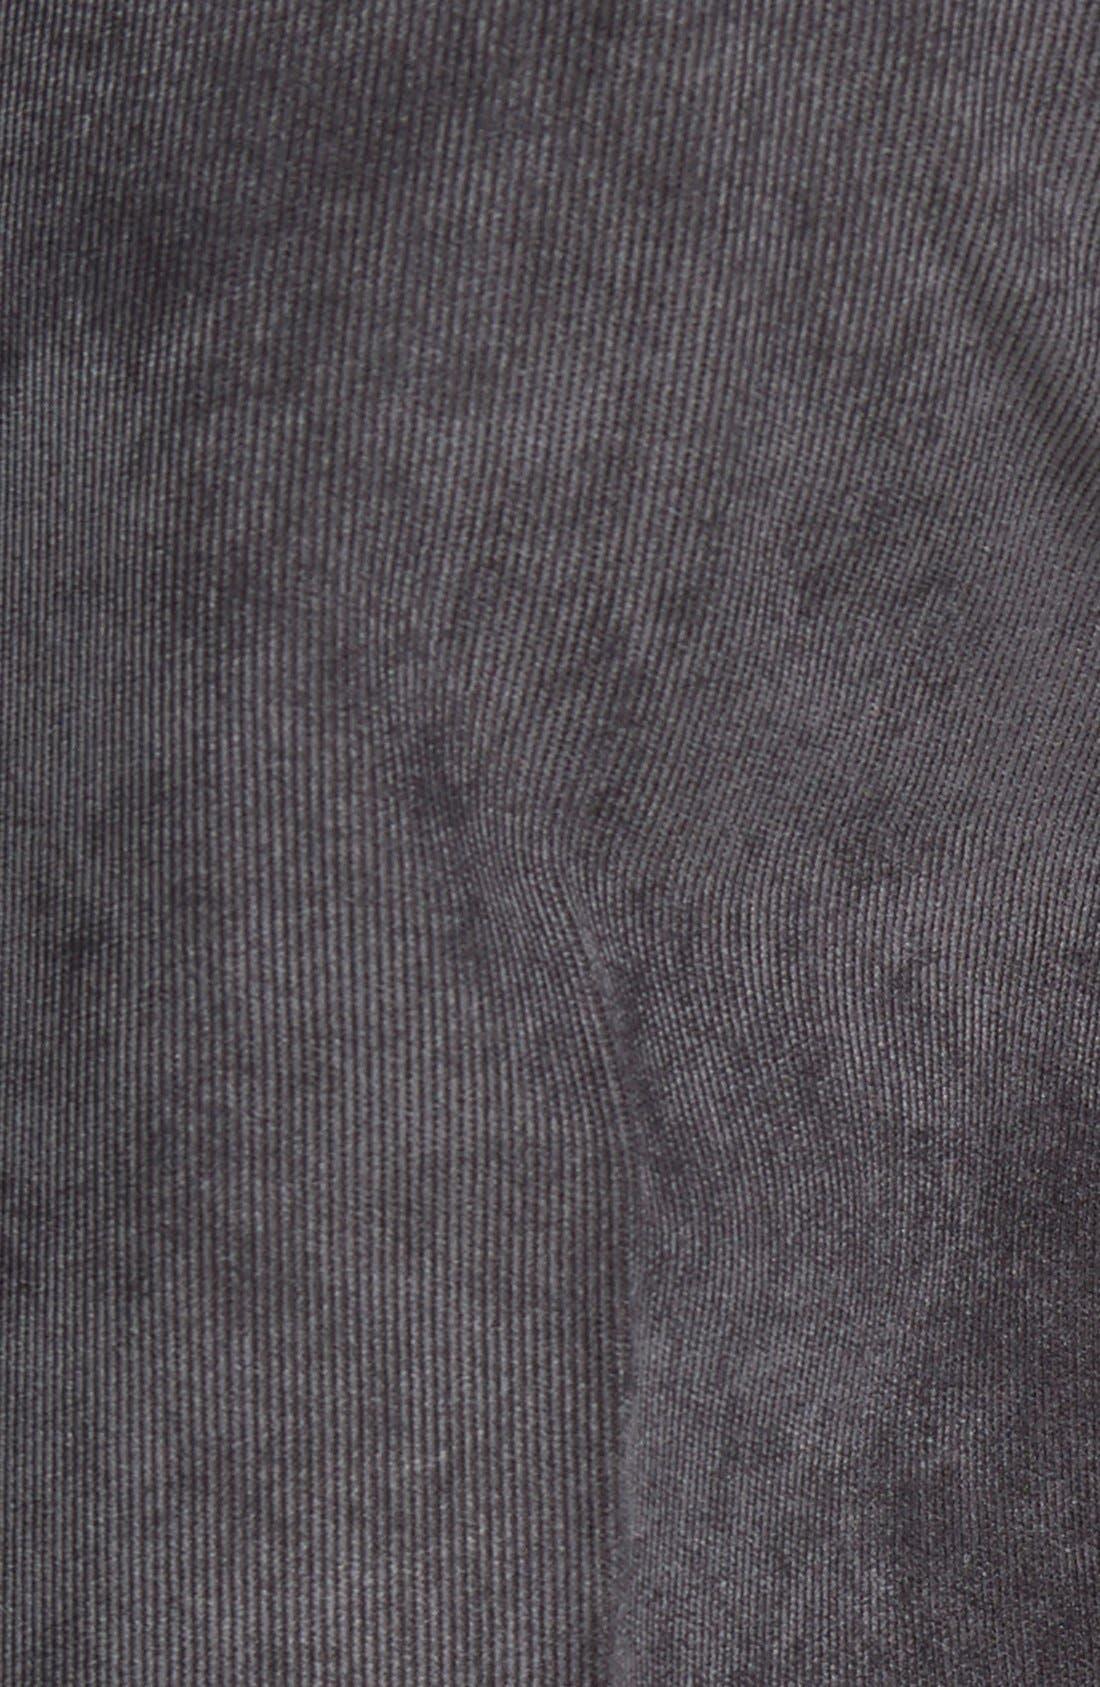 'Micro Air' Wrinkle Resistant Microfiber Corduroy Pants,                             Alternate thumbnail 2, color,                             023